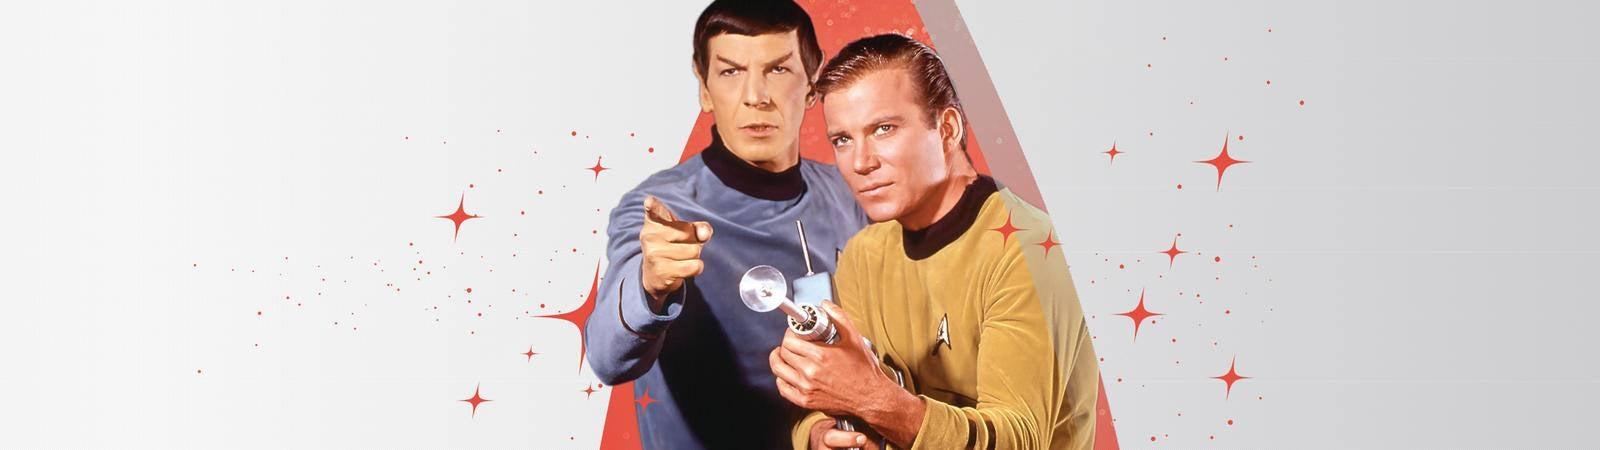 """Star Trek: Exploring New Worlds"" at Skirball Cultural Center"